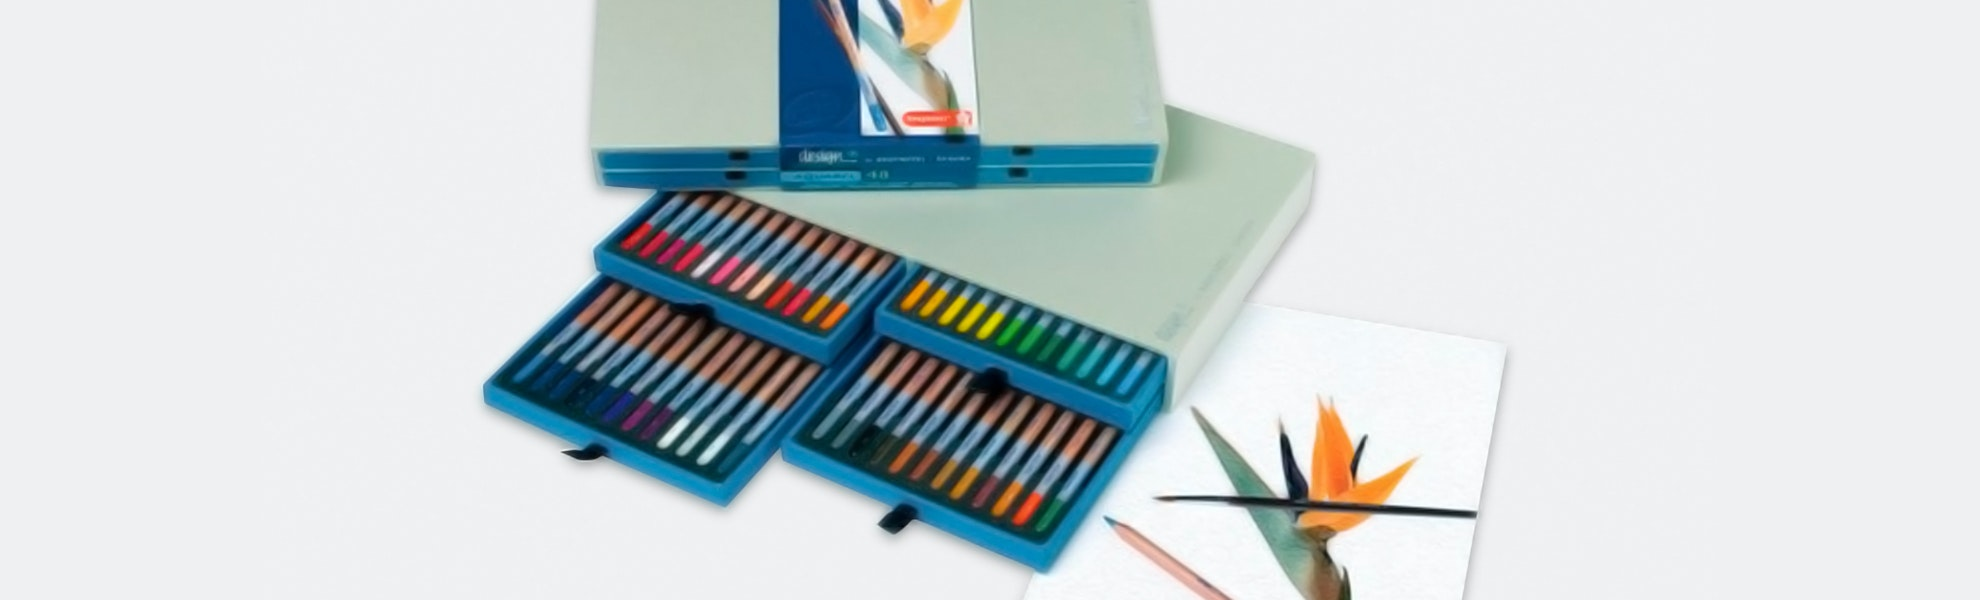 Design Aquarel Pencil Set By Bruynzeel (48 Count)